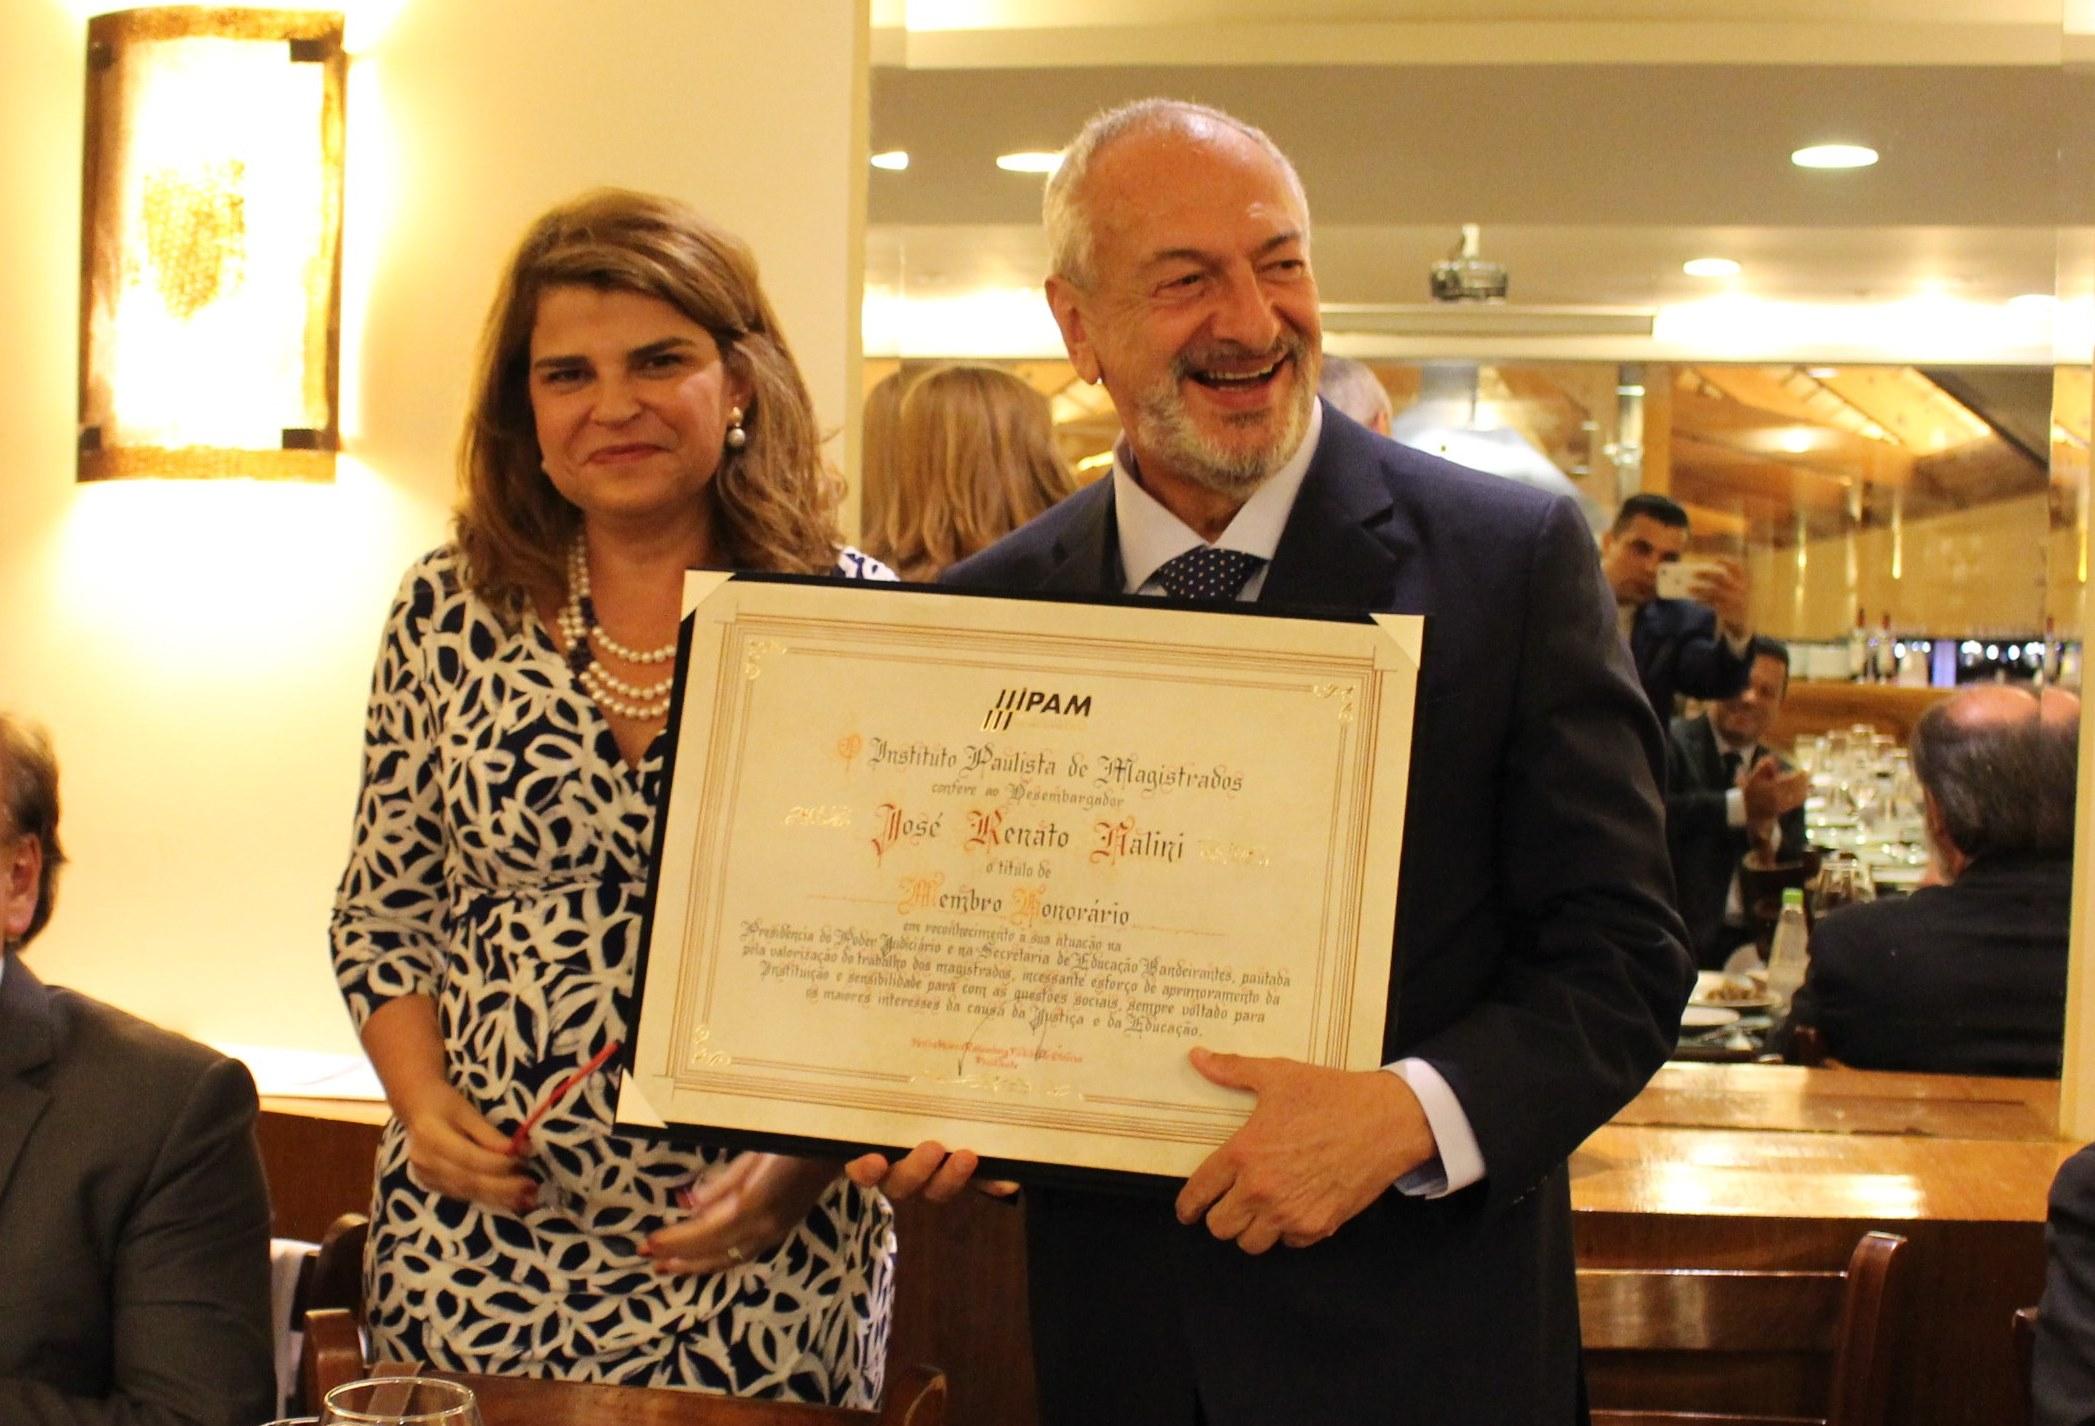 Desembargador José Renato Nalini recebe título de membro honorário do IPAM